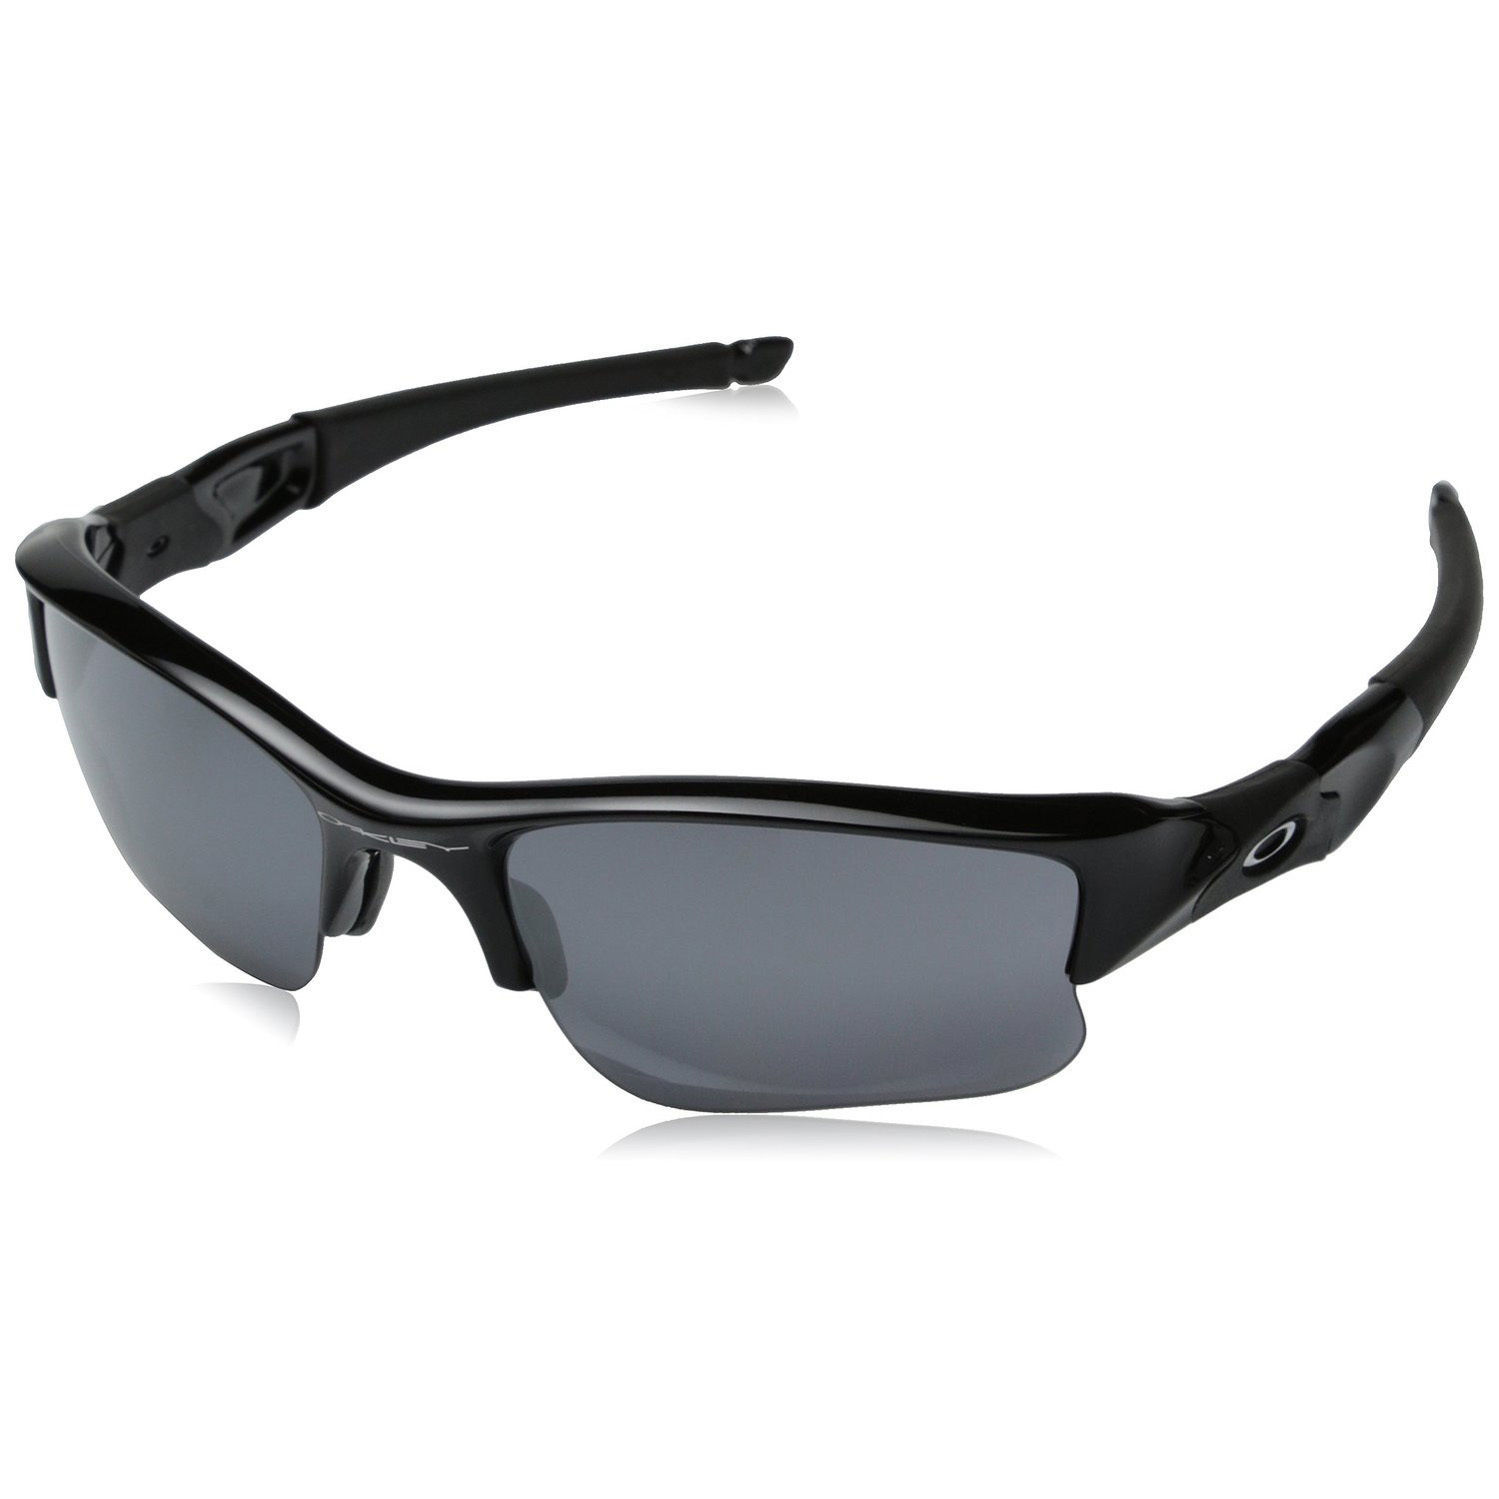 b4aed3c26d S l1600. S l1600. Oakley Flak Jacket XLJ Mens Sunglasses Jet Black Frame Black  Iridium Lens 03-915